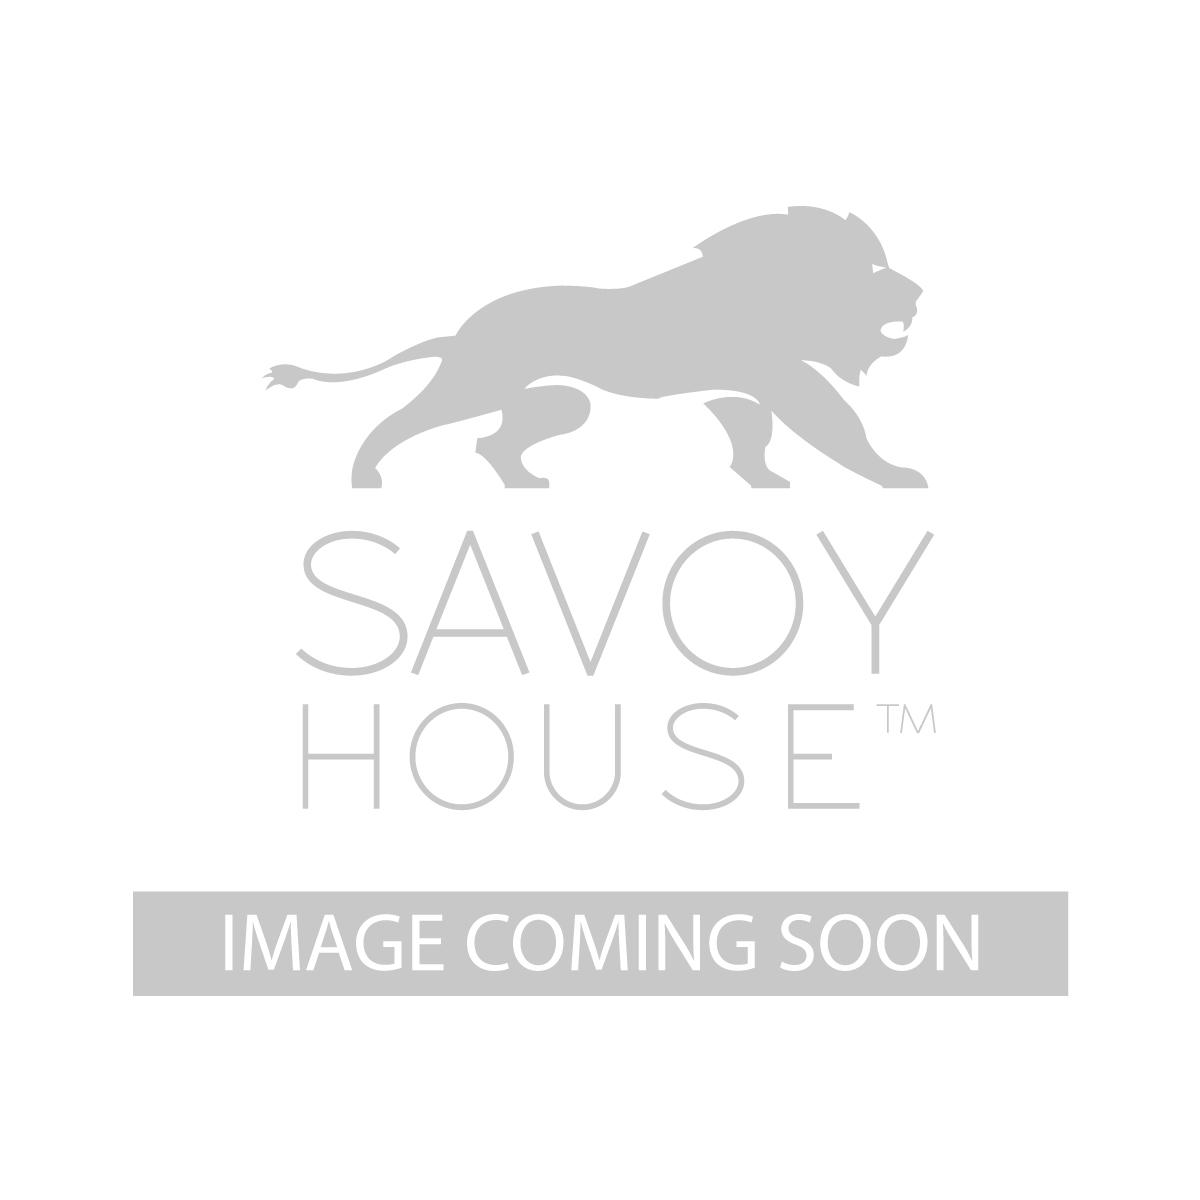 7 253 3 307 rosendal pendant by savoy house for Www savoyhouse com